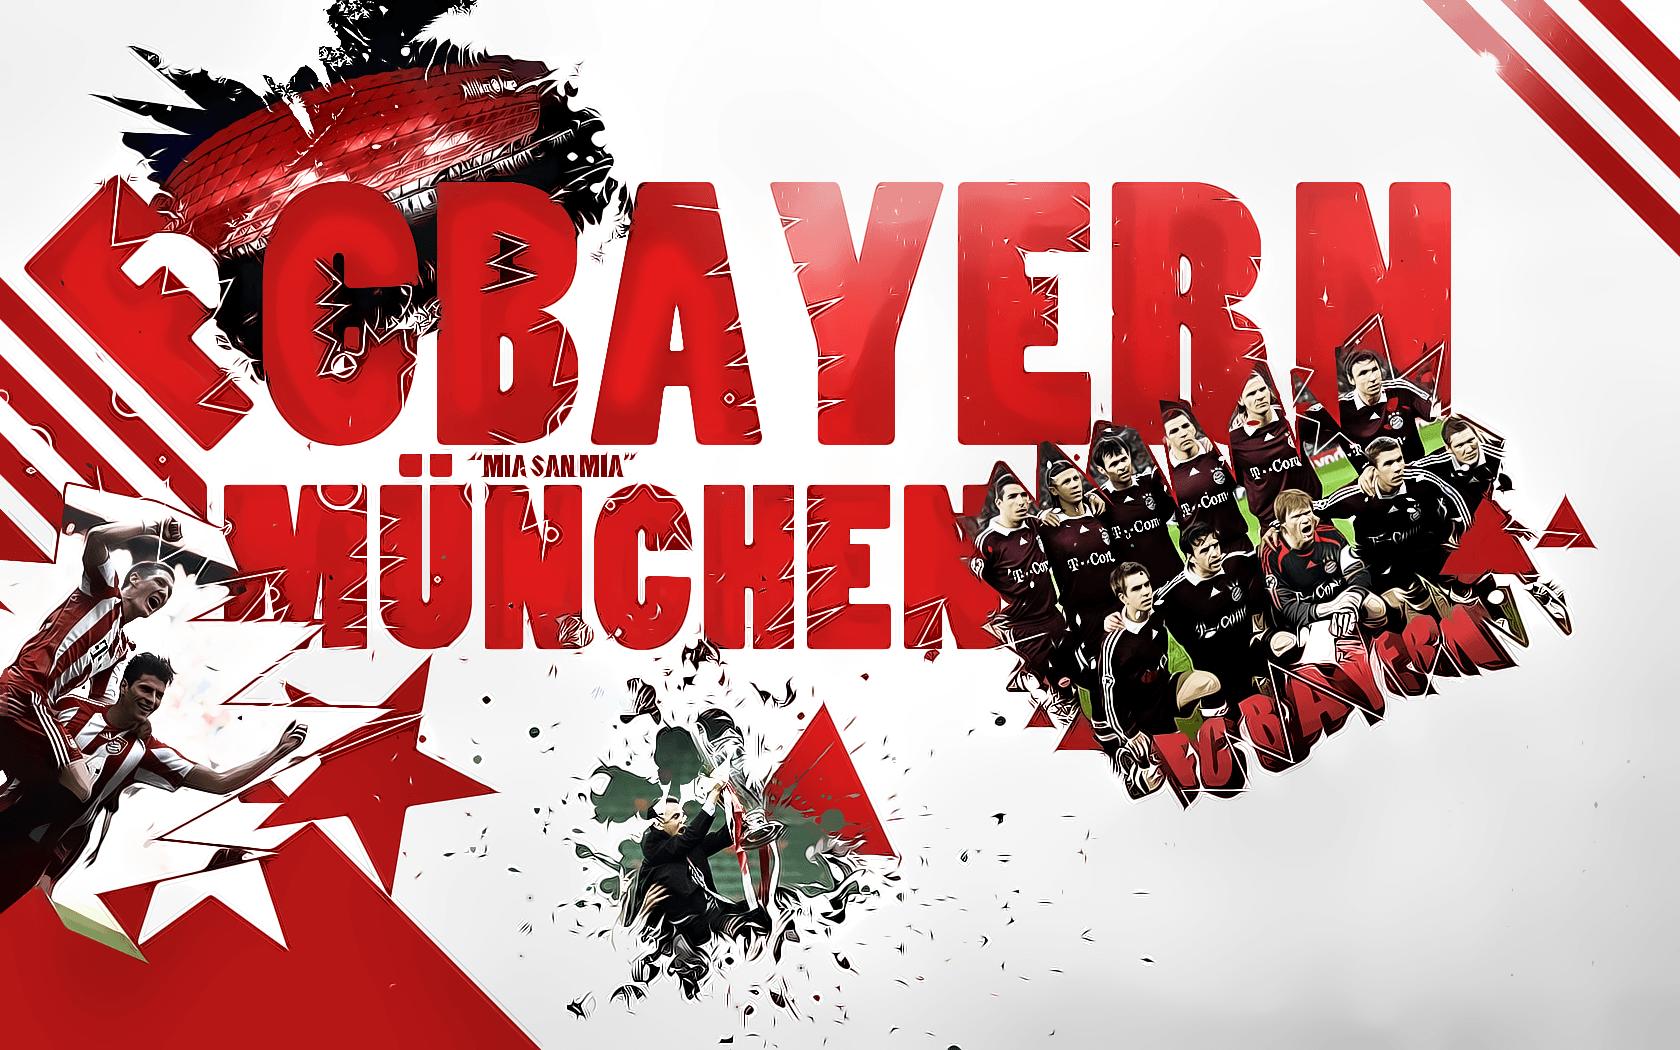 Fc bayern munich 2018 wallpapers wallpaper cave fc bayern mnchen wide wallpaper football hd wallpapers voltagebd Images